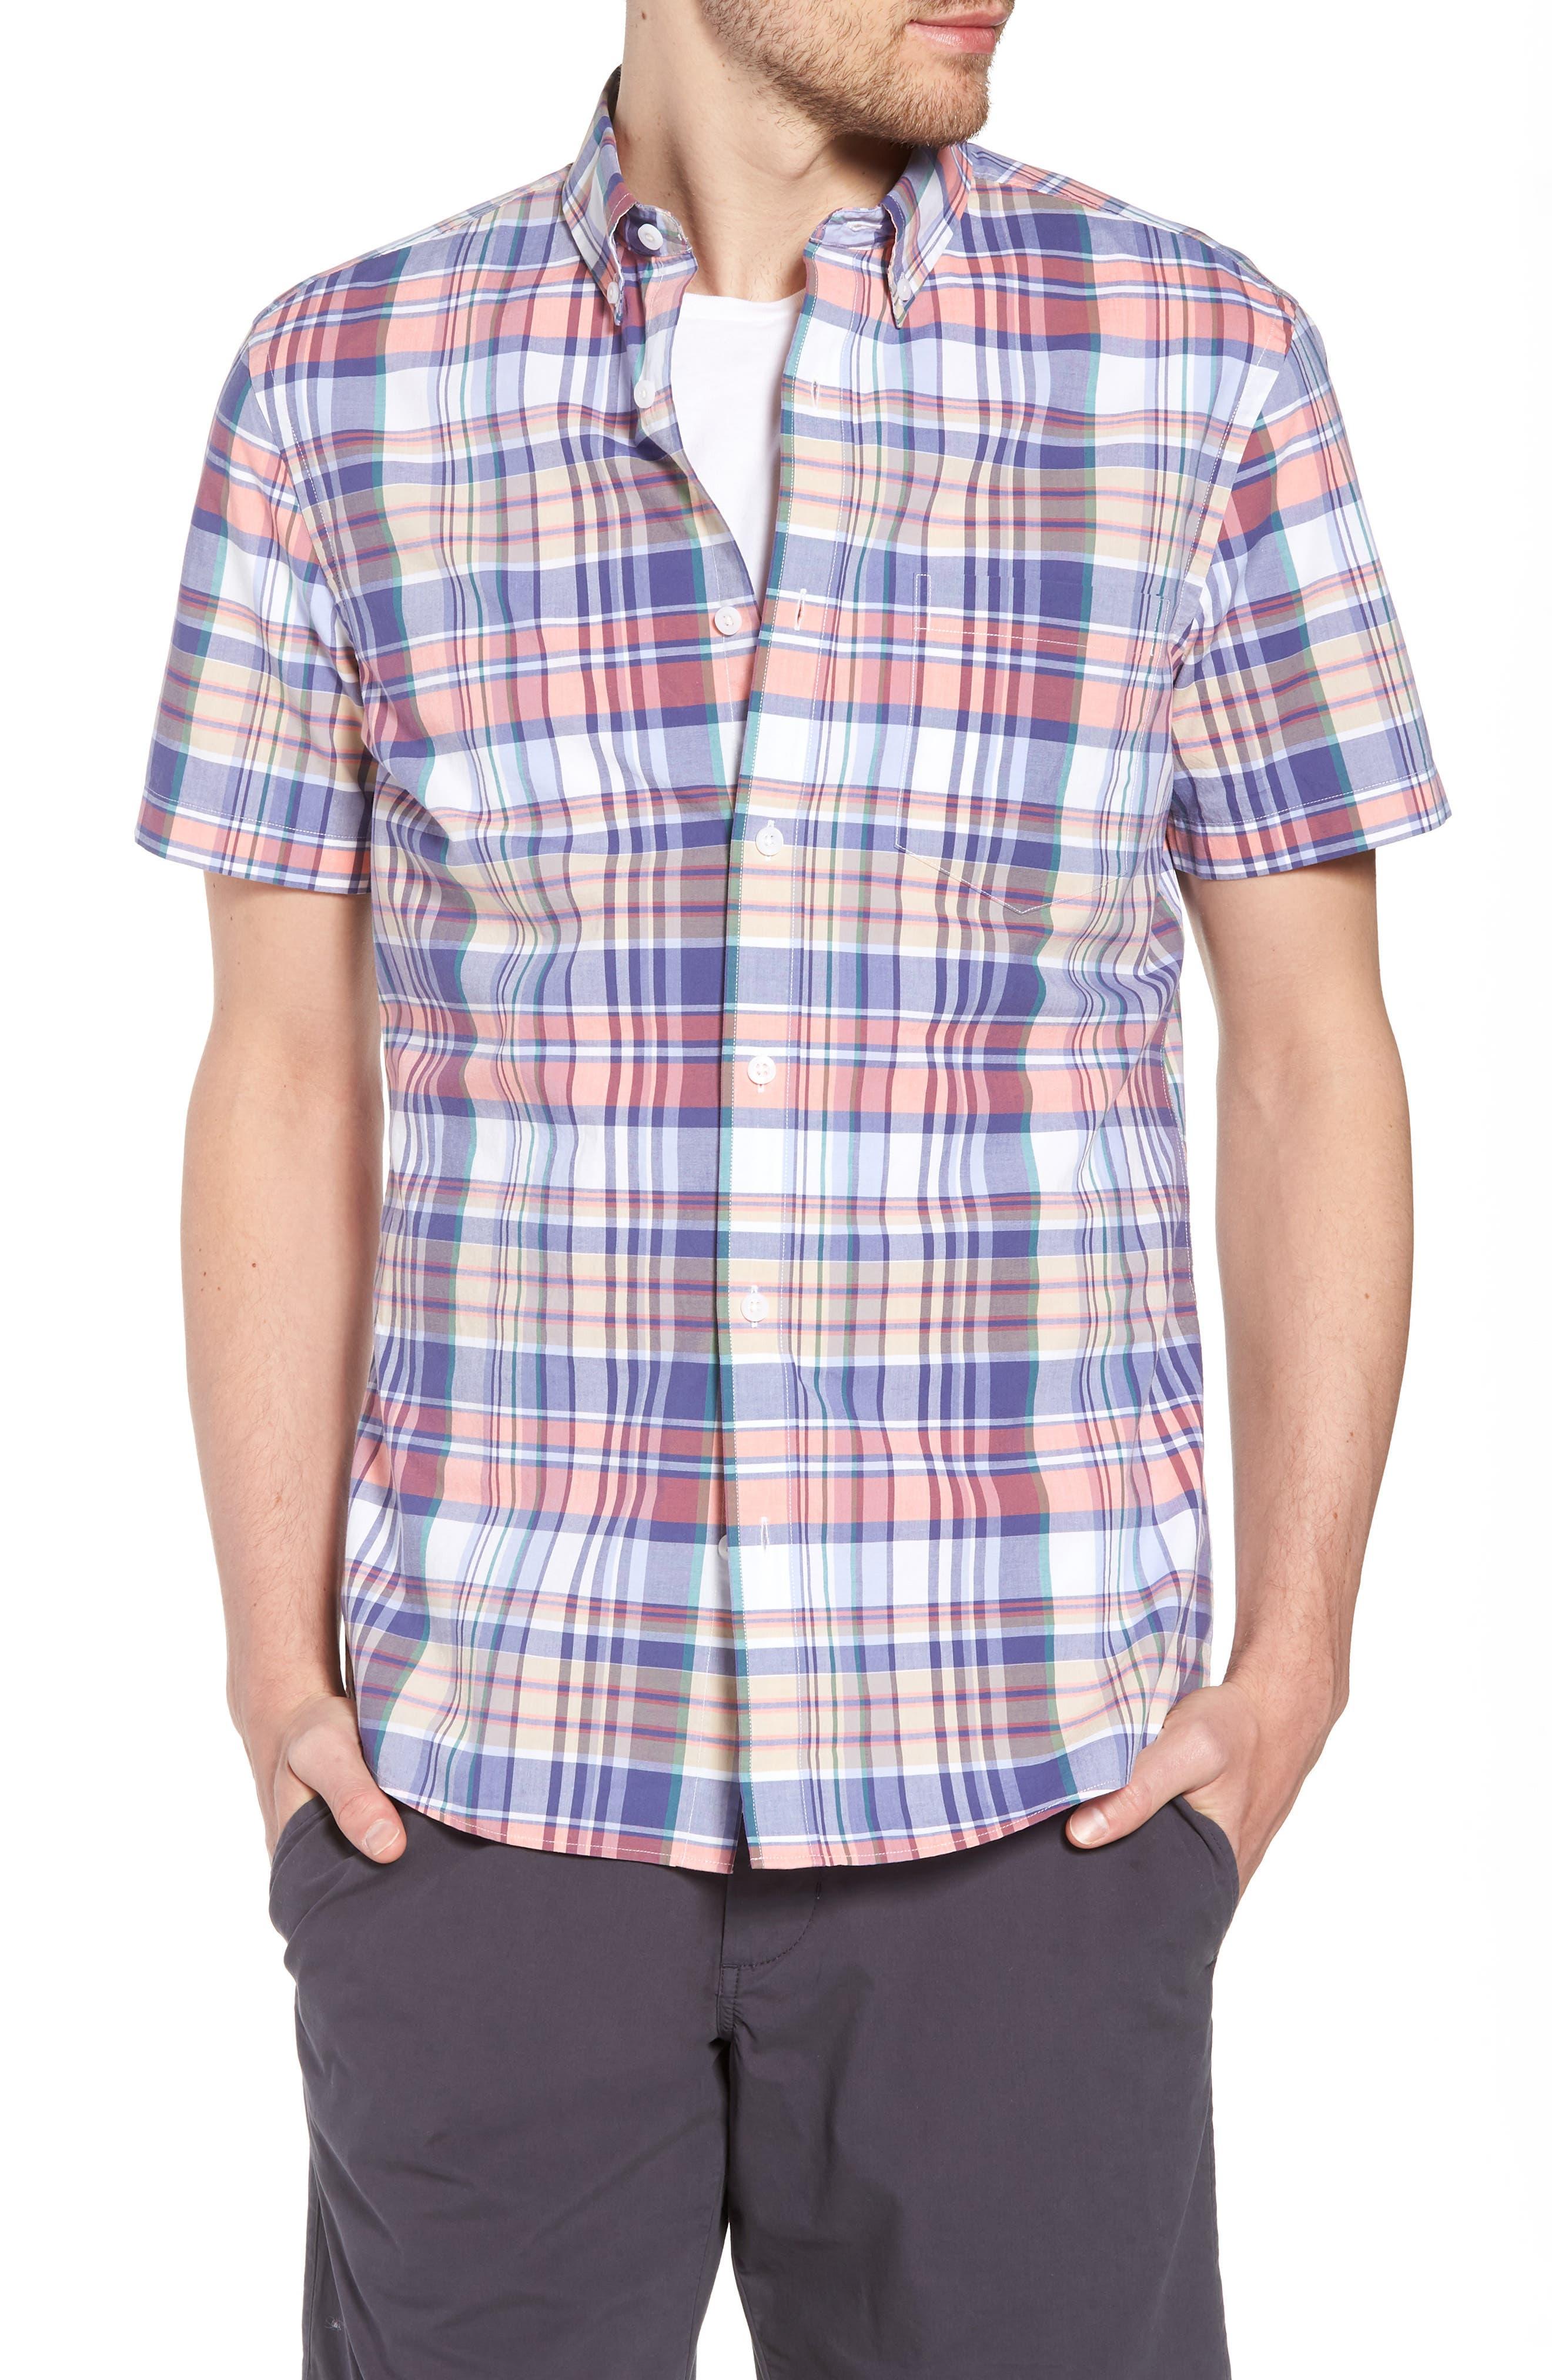 Trim Fit Plaid Short Sleeve Sport Shirt,                             Main thumbnail 1, color,                             Navy Coral Multi Plaid